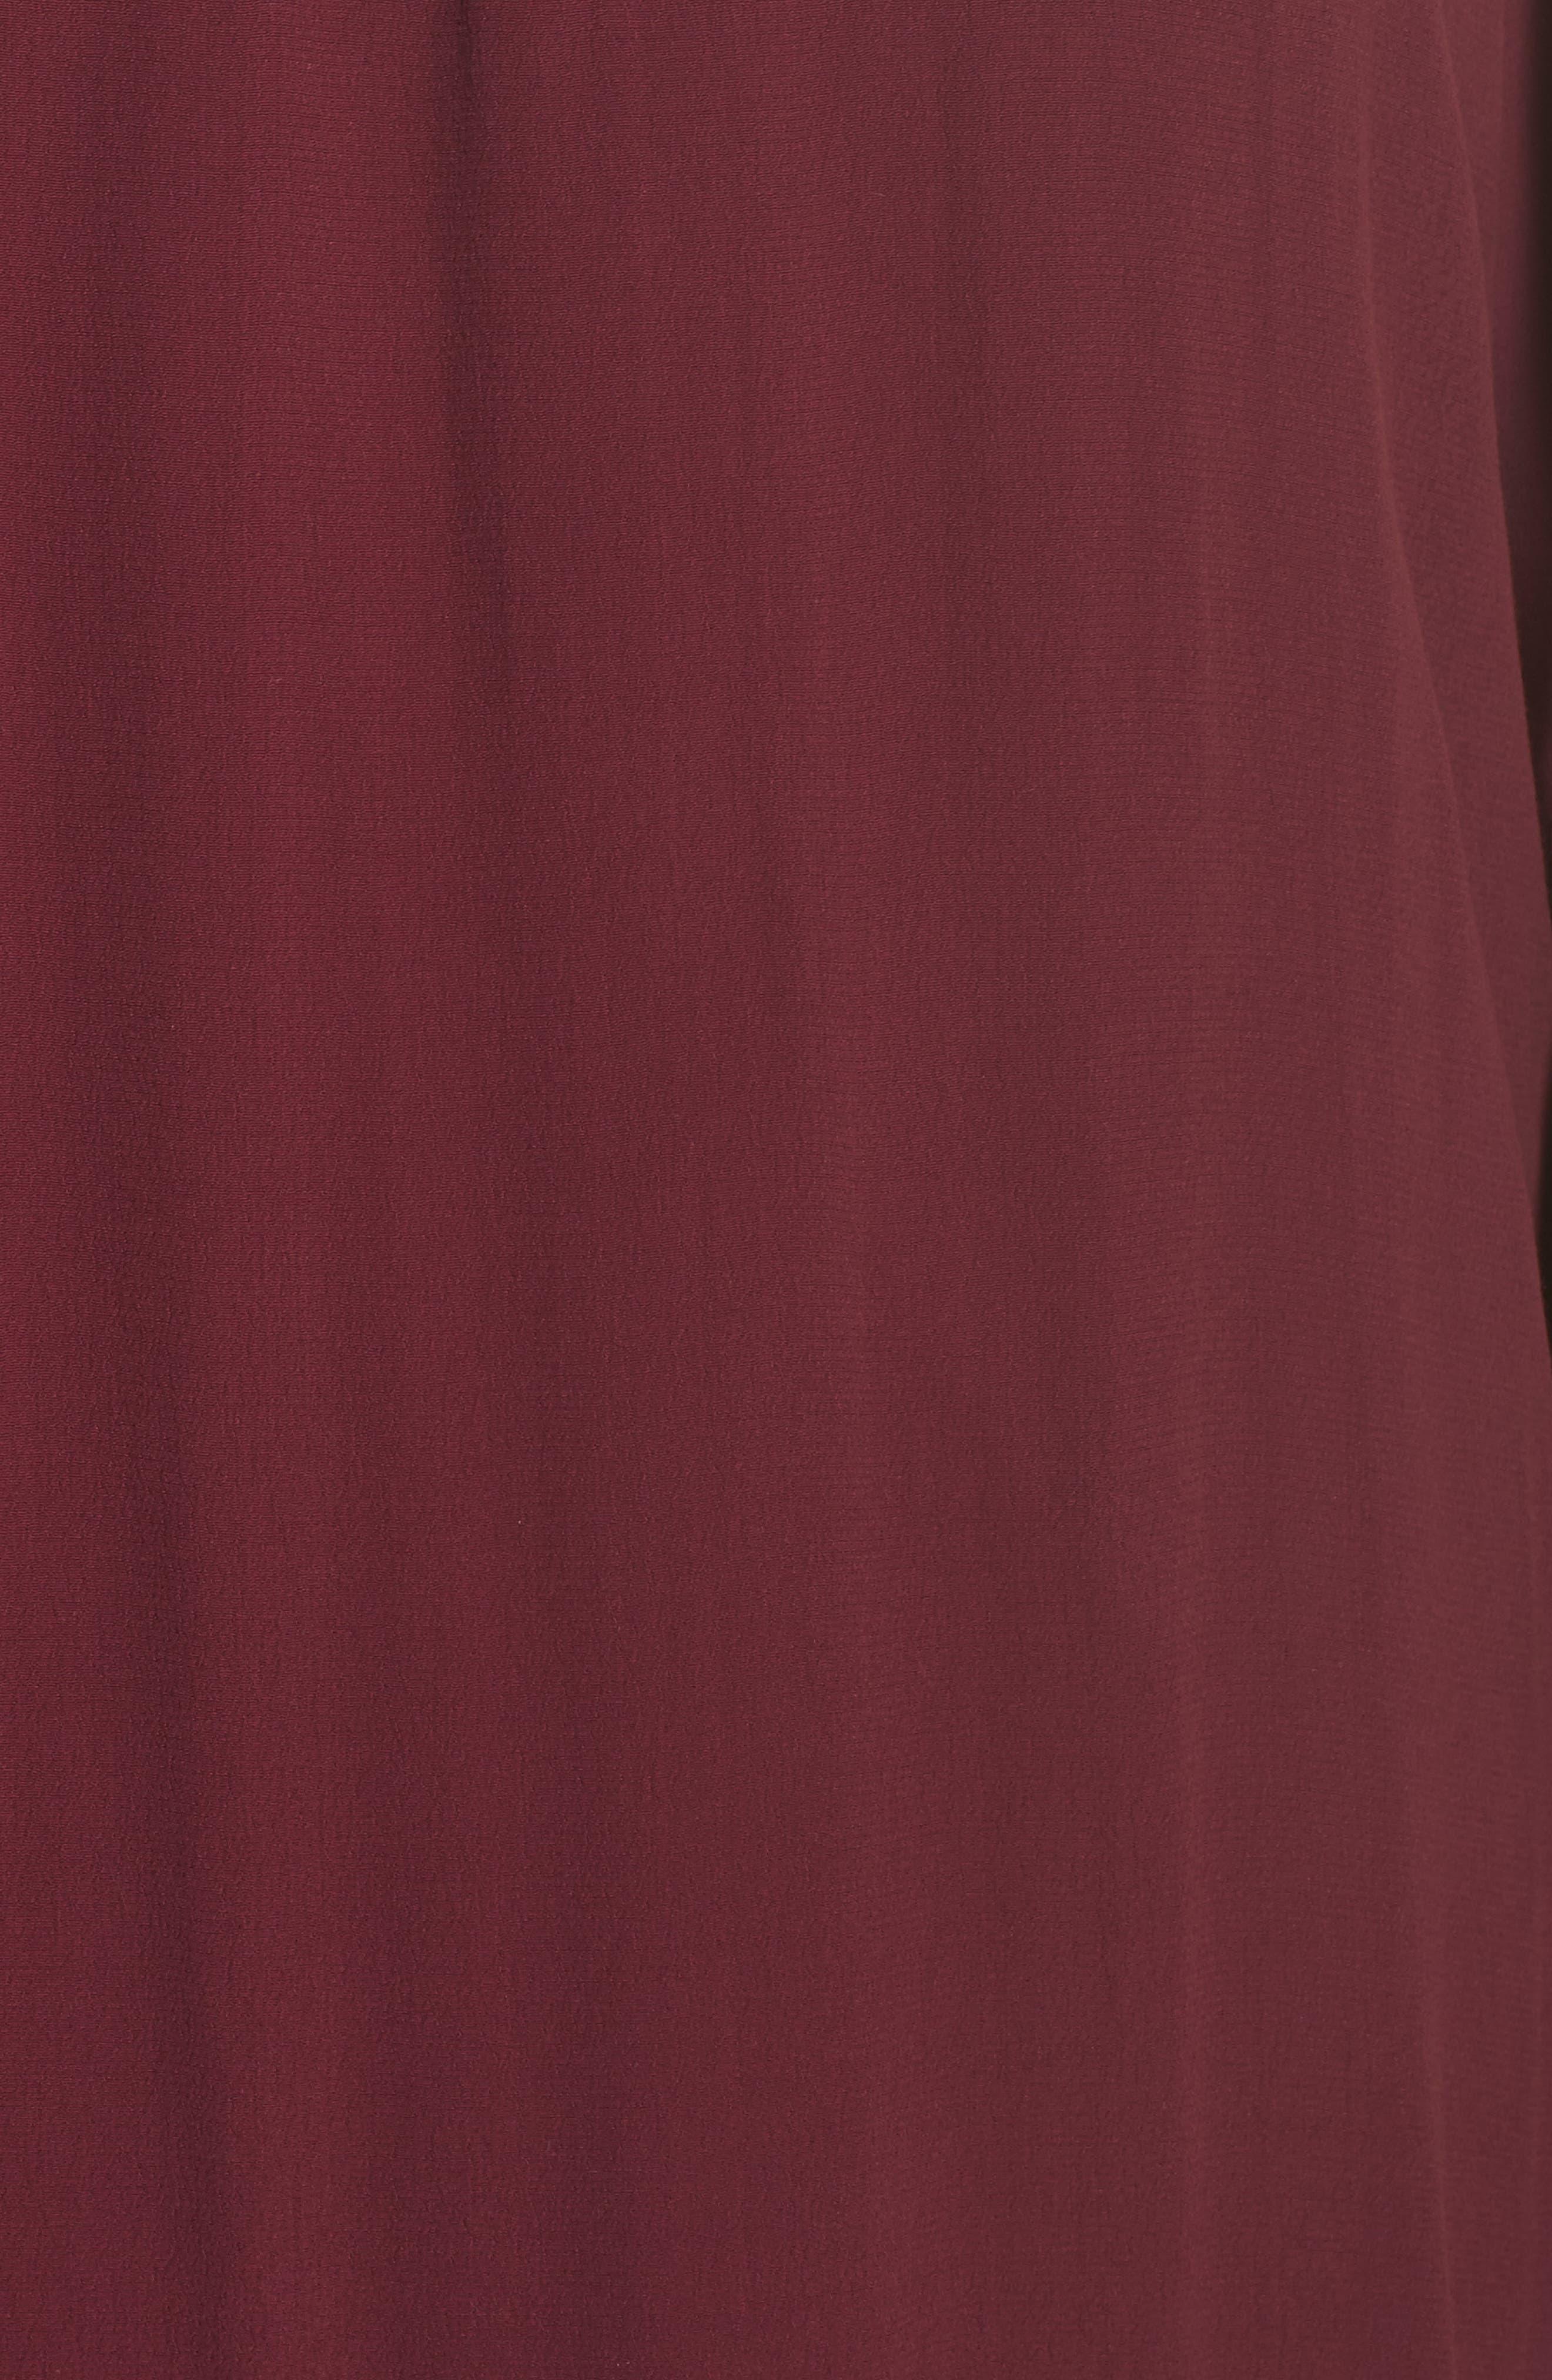 Jolie Lace Accent Cover-Up Dress,                             Alternate thumbnail 5, color,                             Burgundy